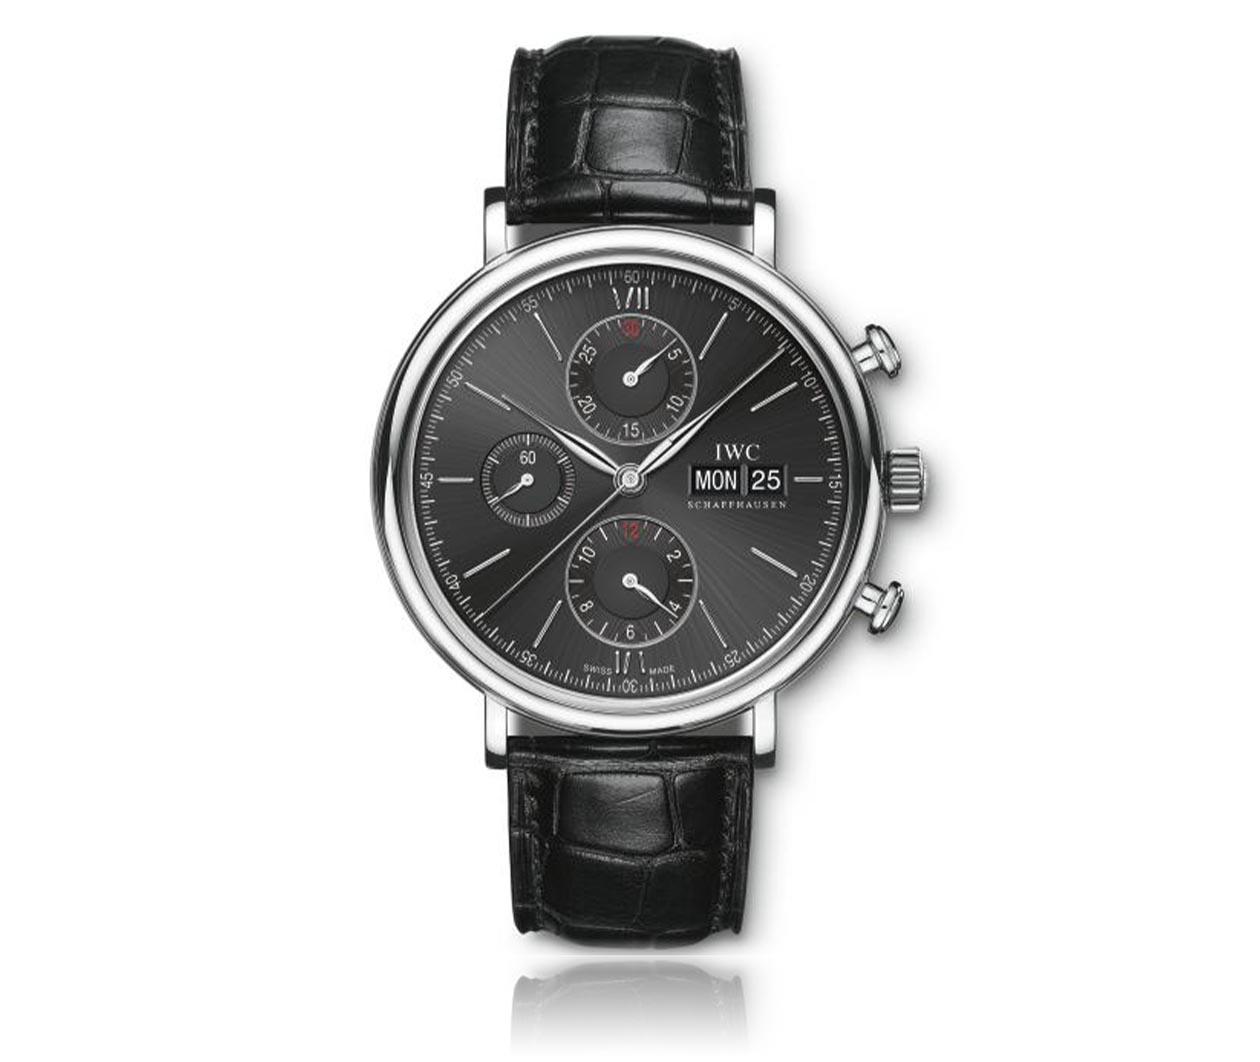 IWC Portofino Chronograph IW391029 Flatlay FINAL